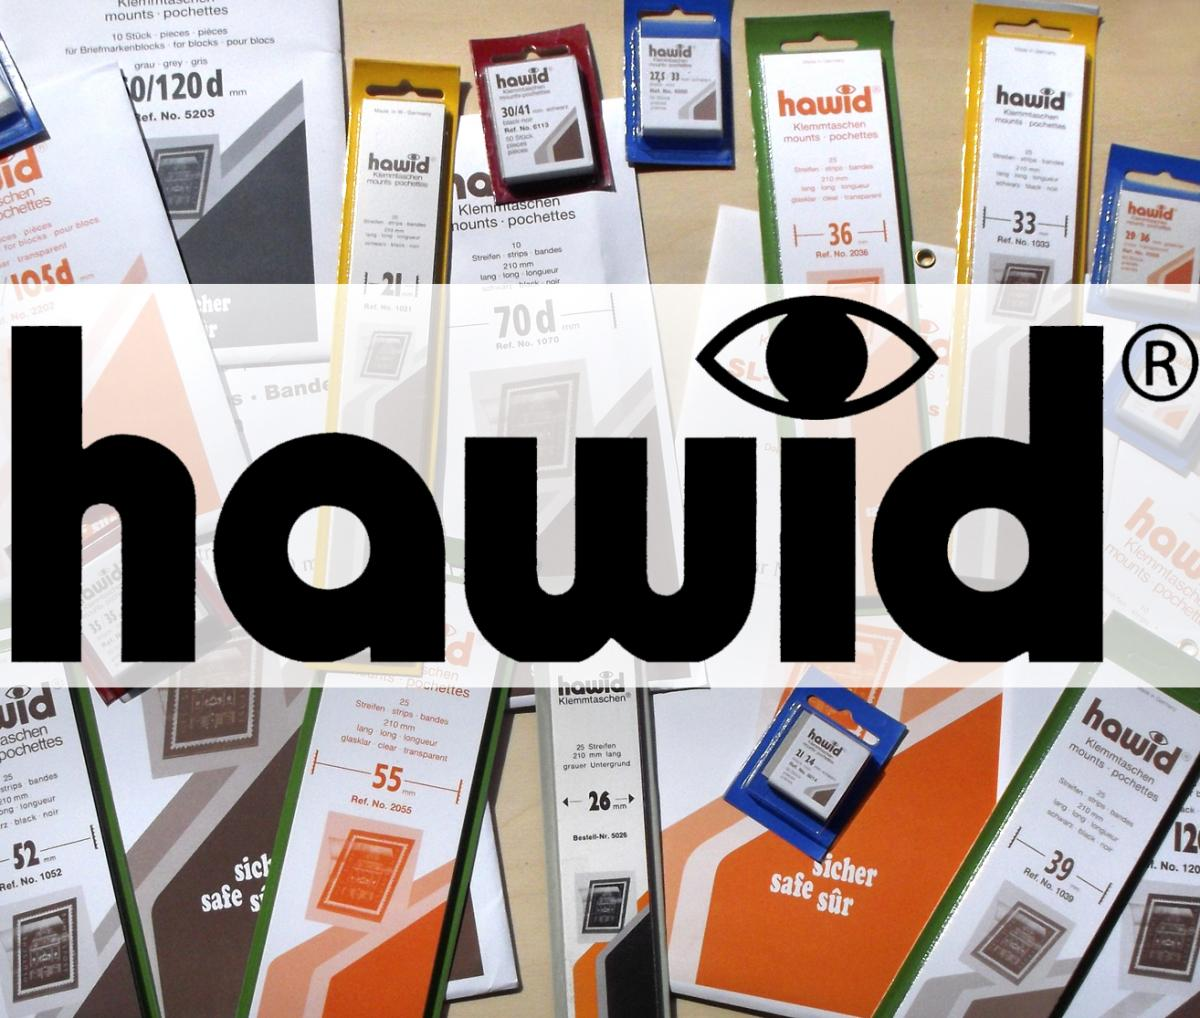 HAWID-Blockstreifen 5201, 130 x 85 mm, grau, 10er-Pack, d* 0